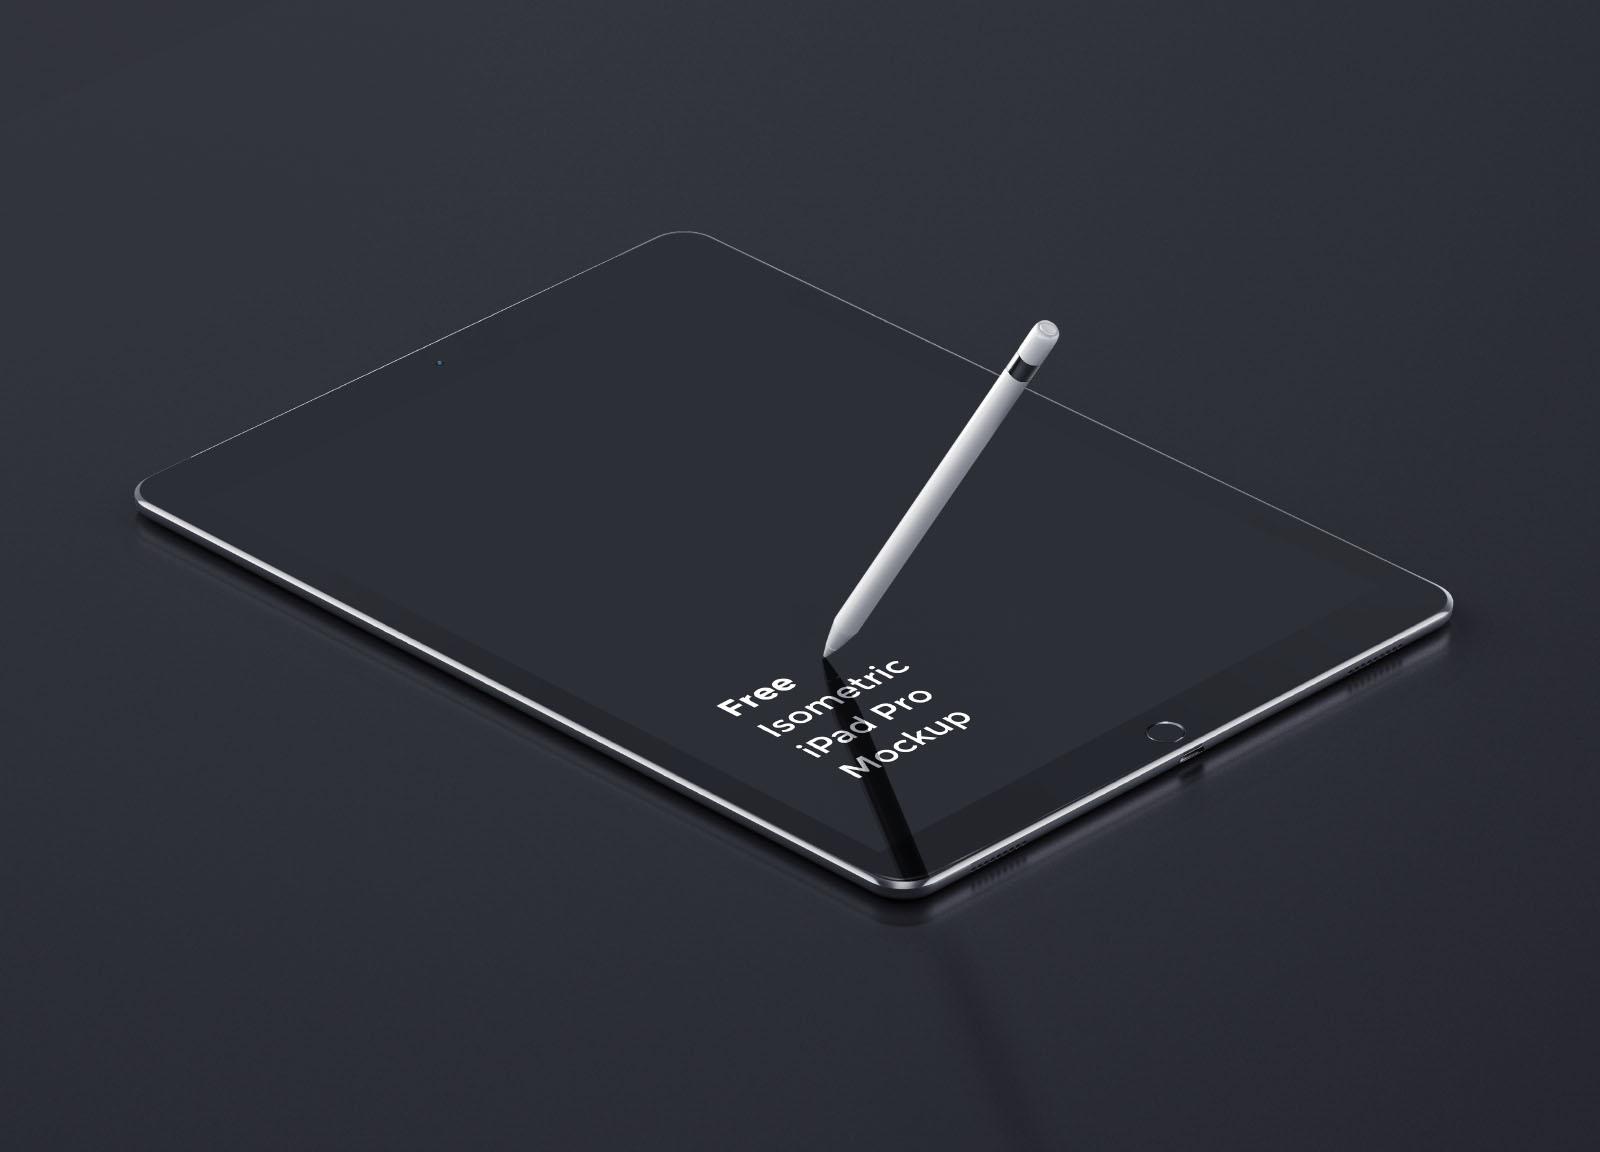 iPad Pro Tablet Perspective Mockup